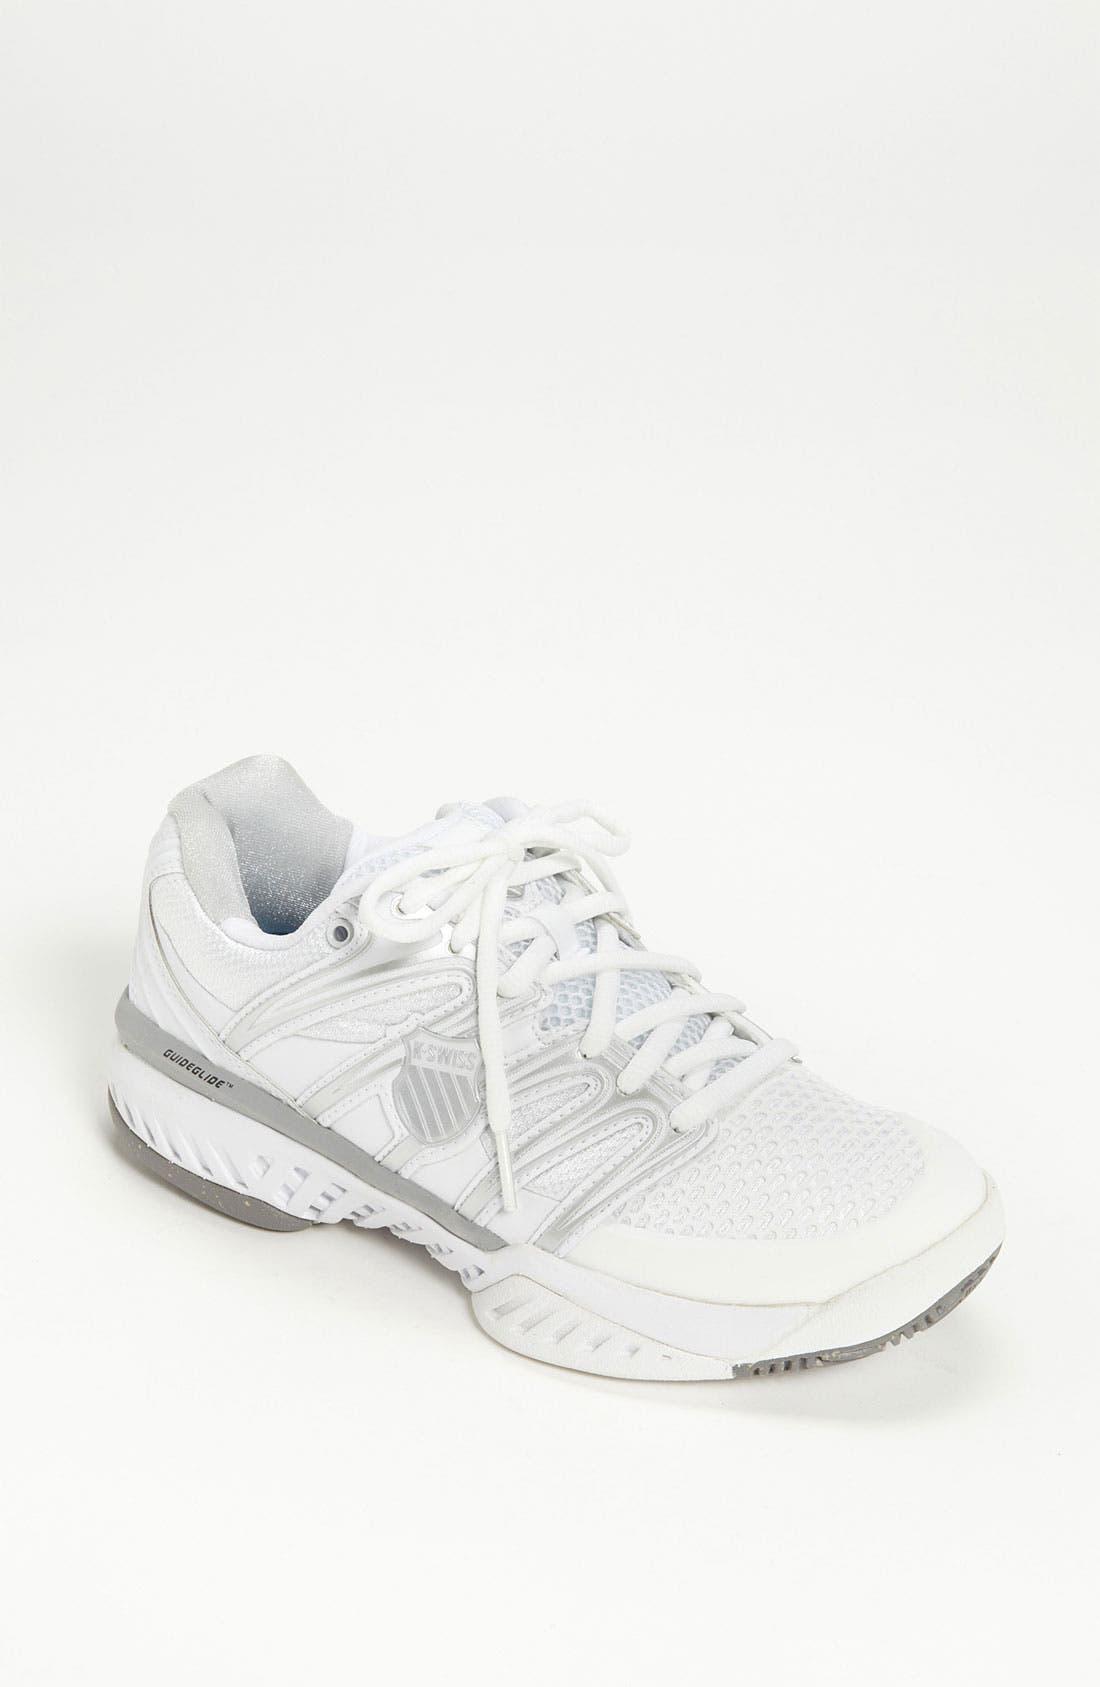 Alternate Image 1 Selected - K-Swiss 'Big Shot' Tennis Shoe (Women)